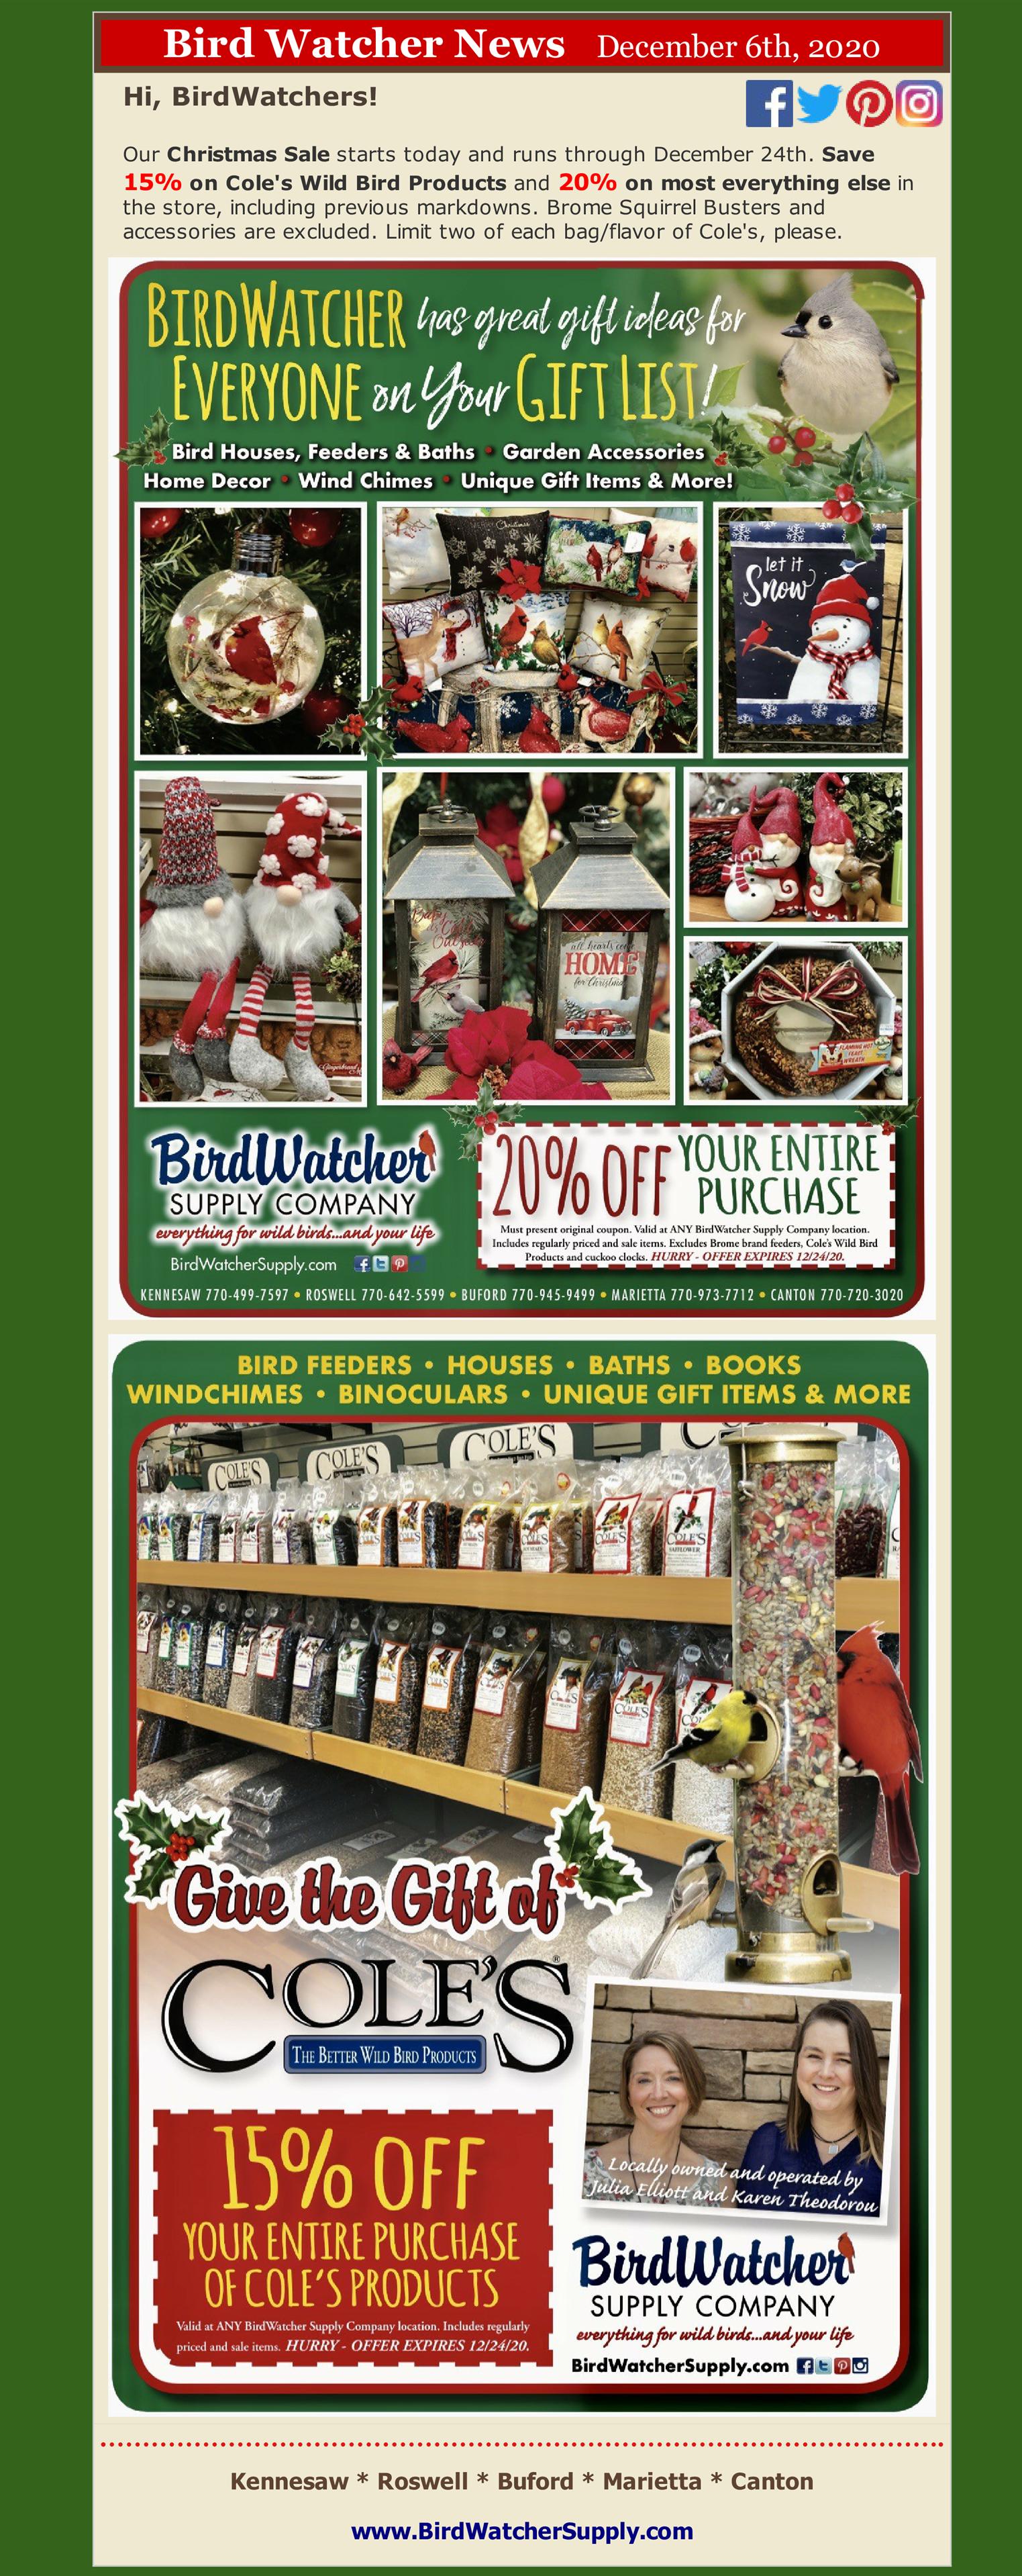 sale, christmas, ornaments, birds, feeders, gifts, holiday, birdfeeder, birdbath, ornaments,windchimes,hummingbirds,jewlery